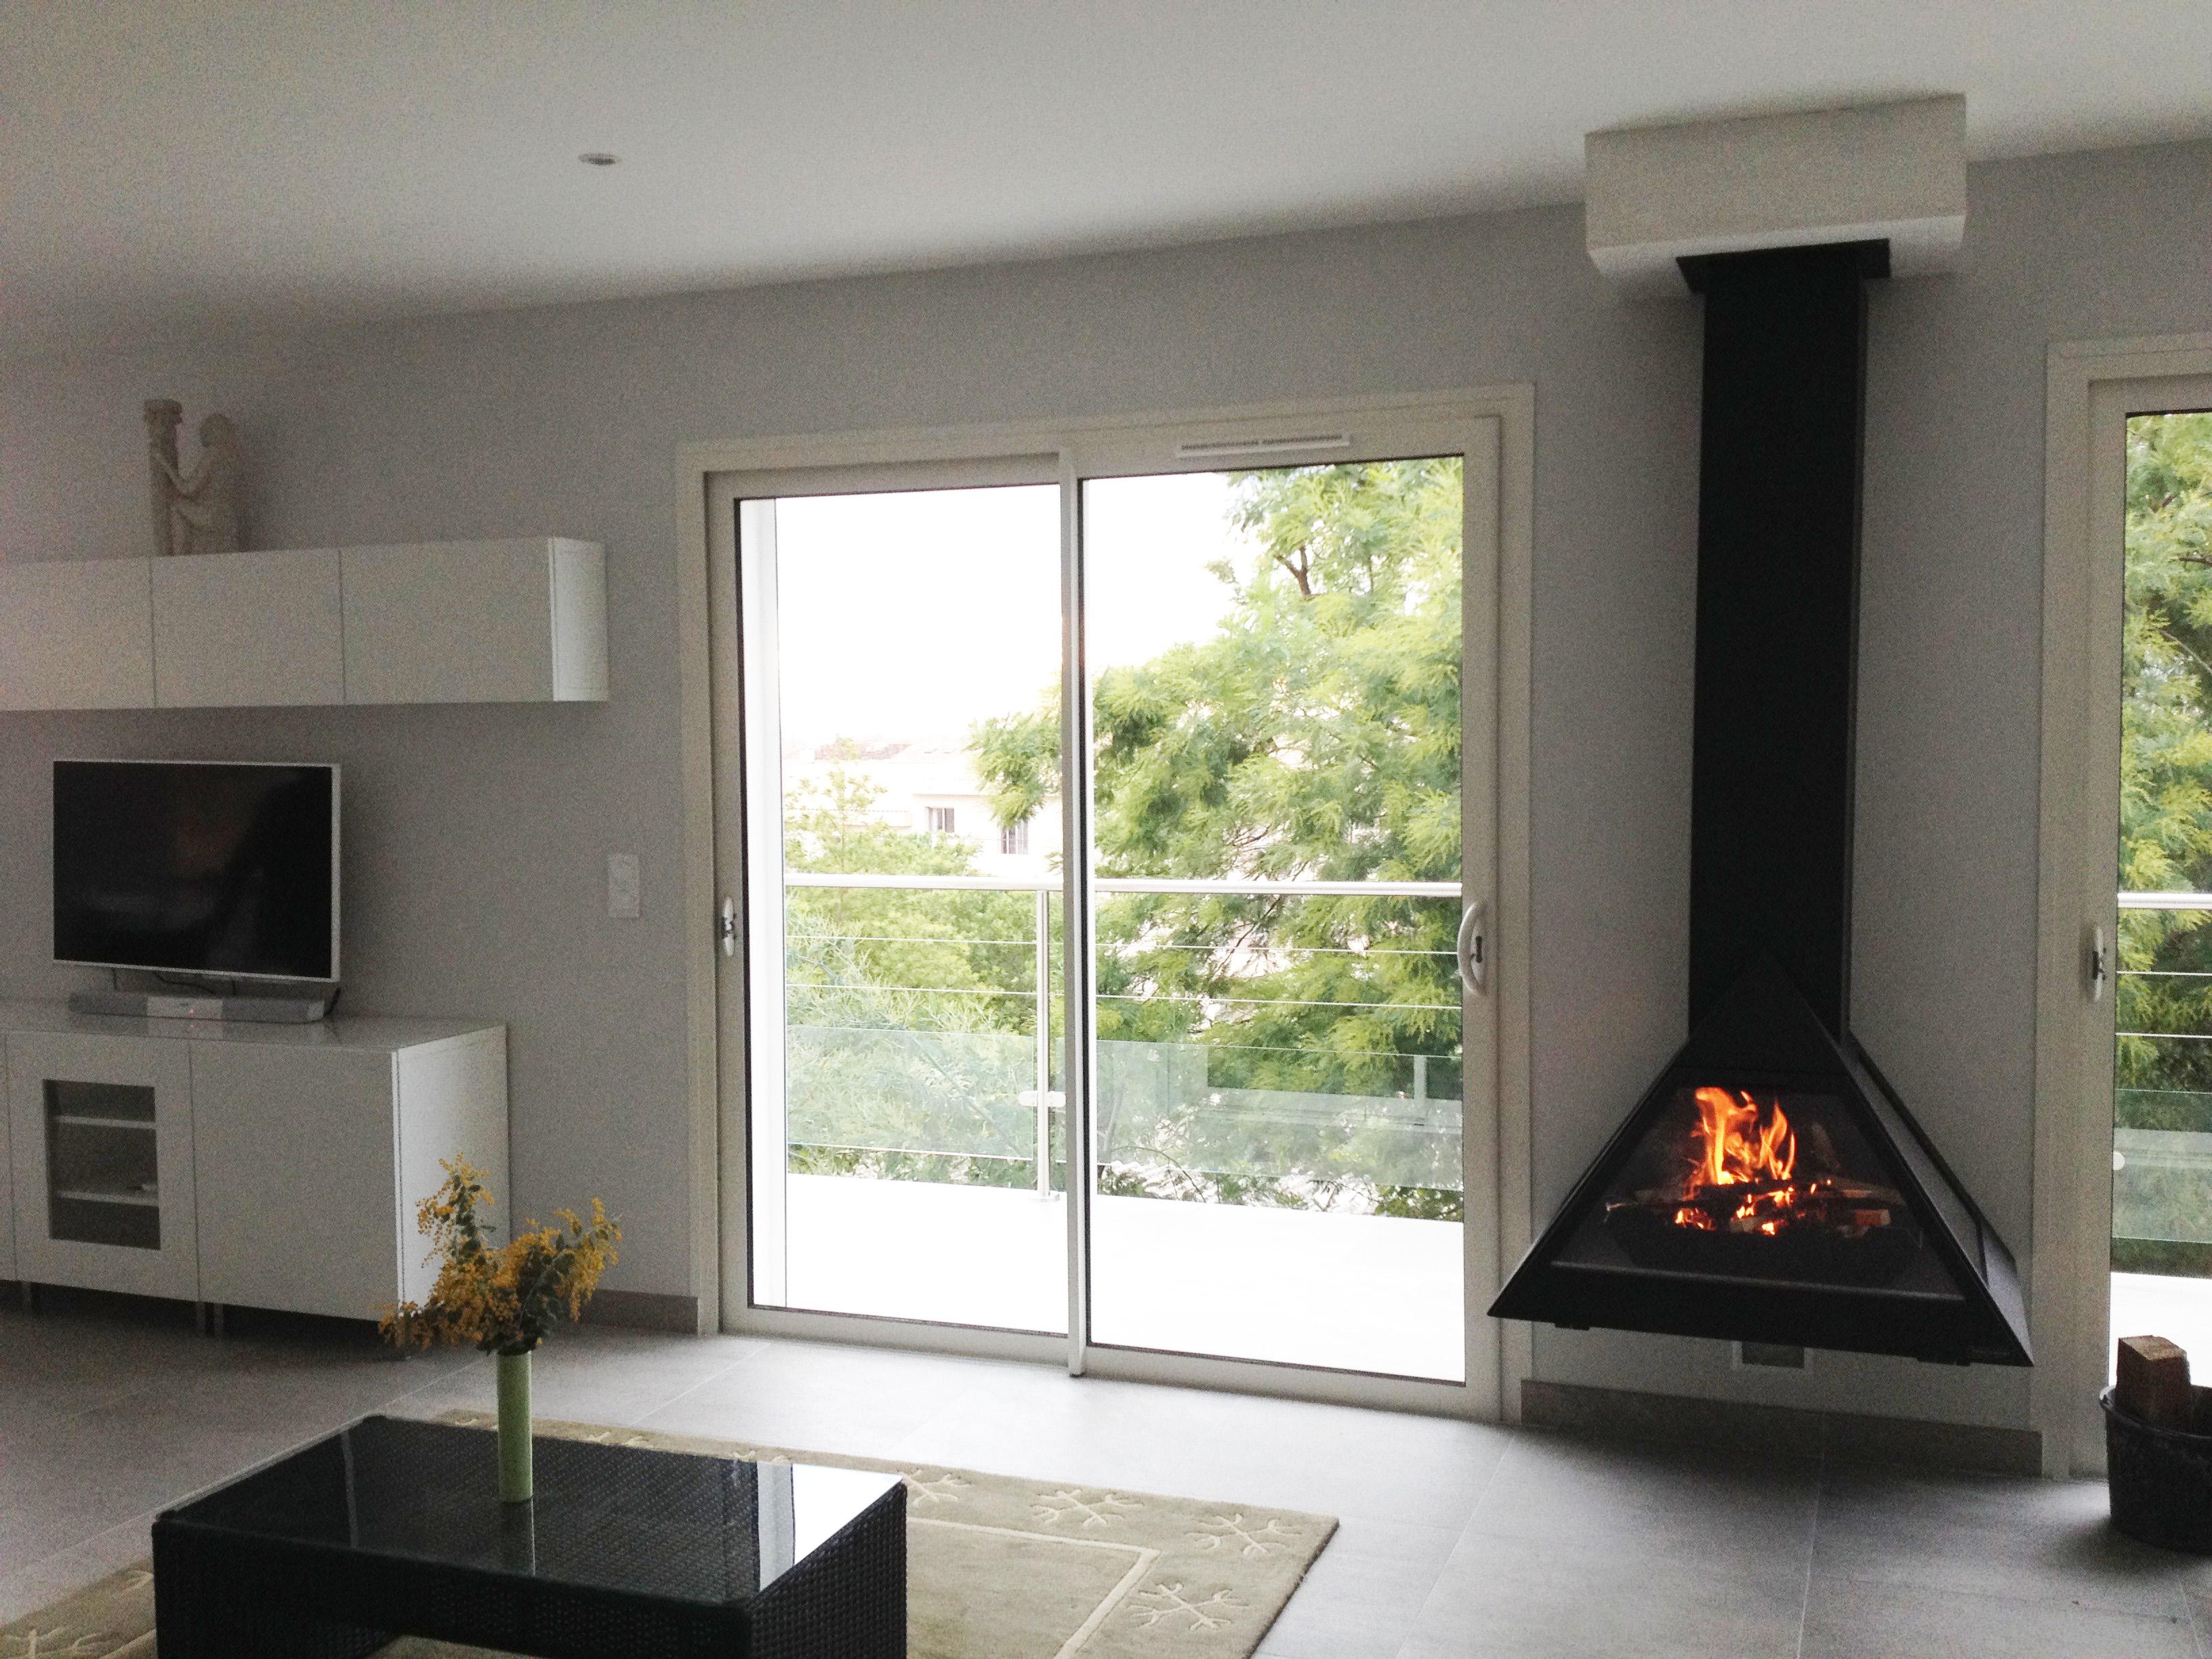 cheminee suspendu chemine centrale suspendue bordelet modle eva centrale foyer ouvert by lu. Black Bedroom Furniture Sets. Home Design Ideas